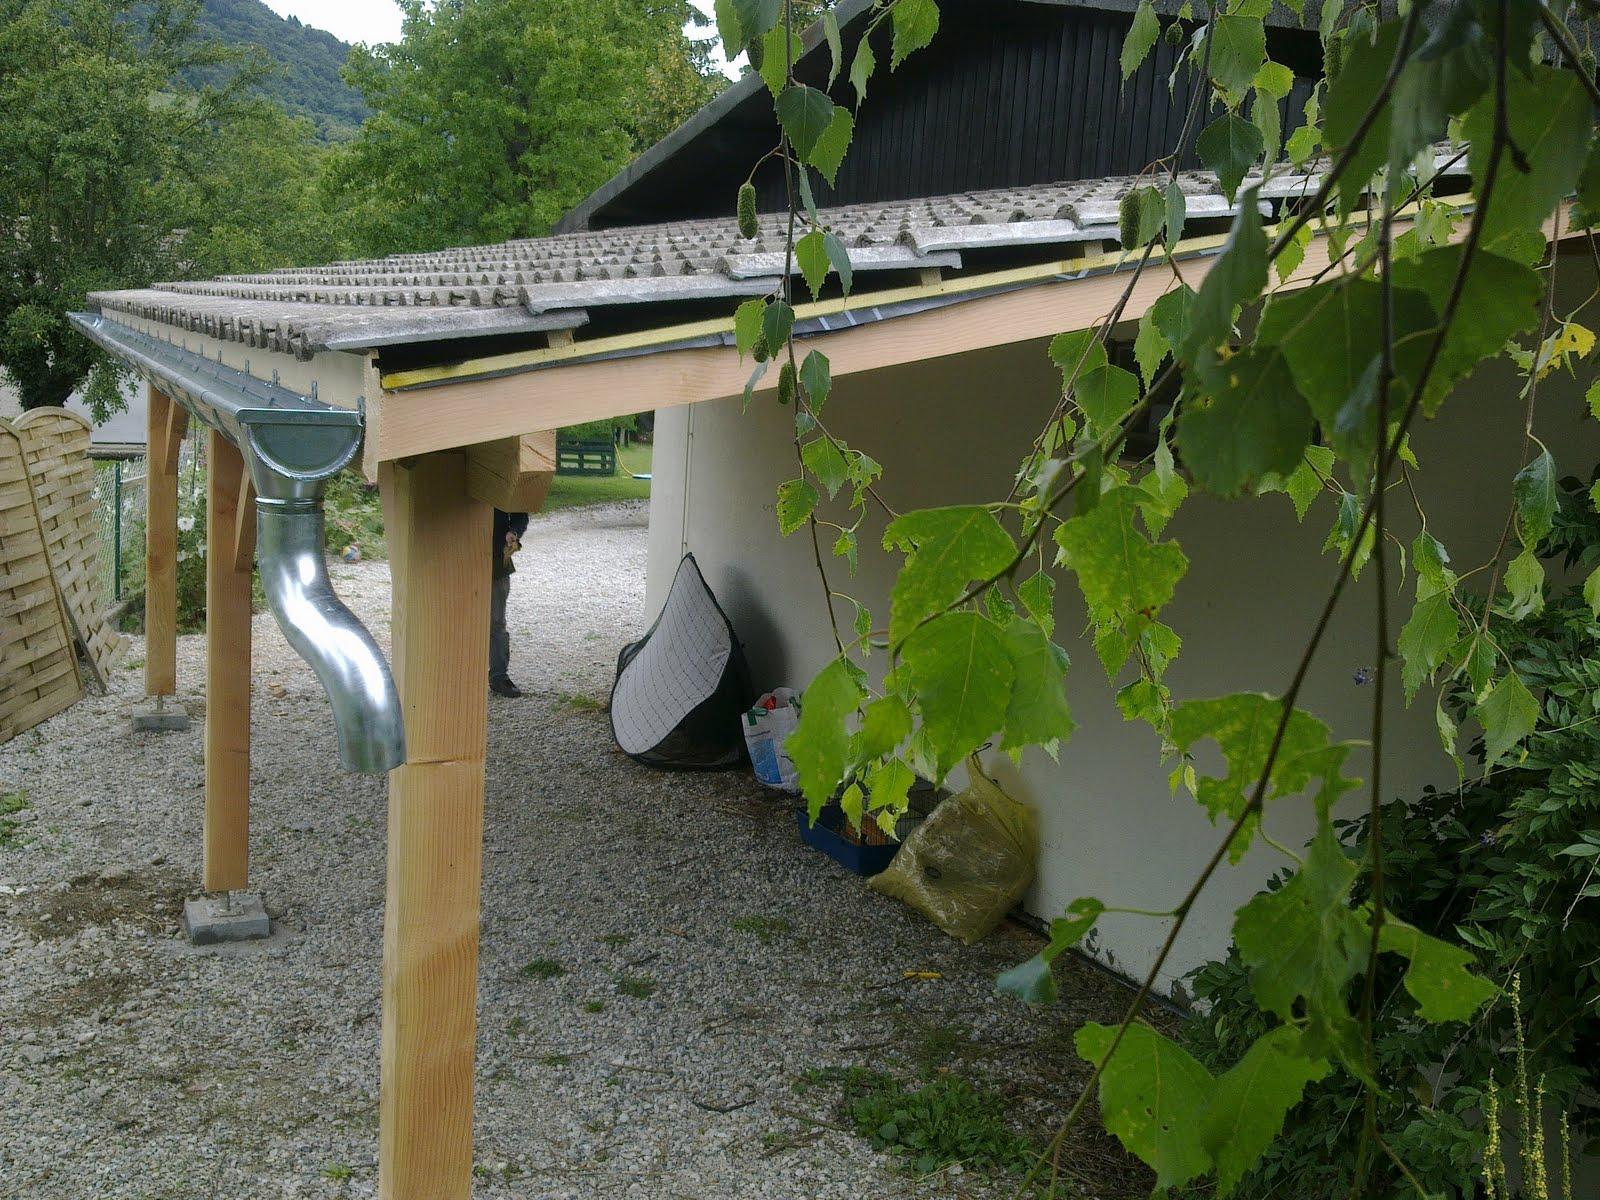 Carport bois 36m2 - Carport adosse pas cher ...